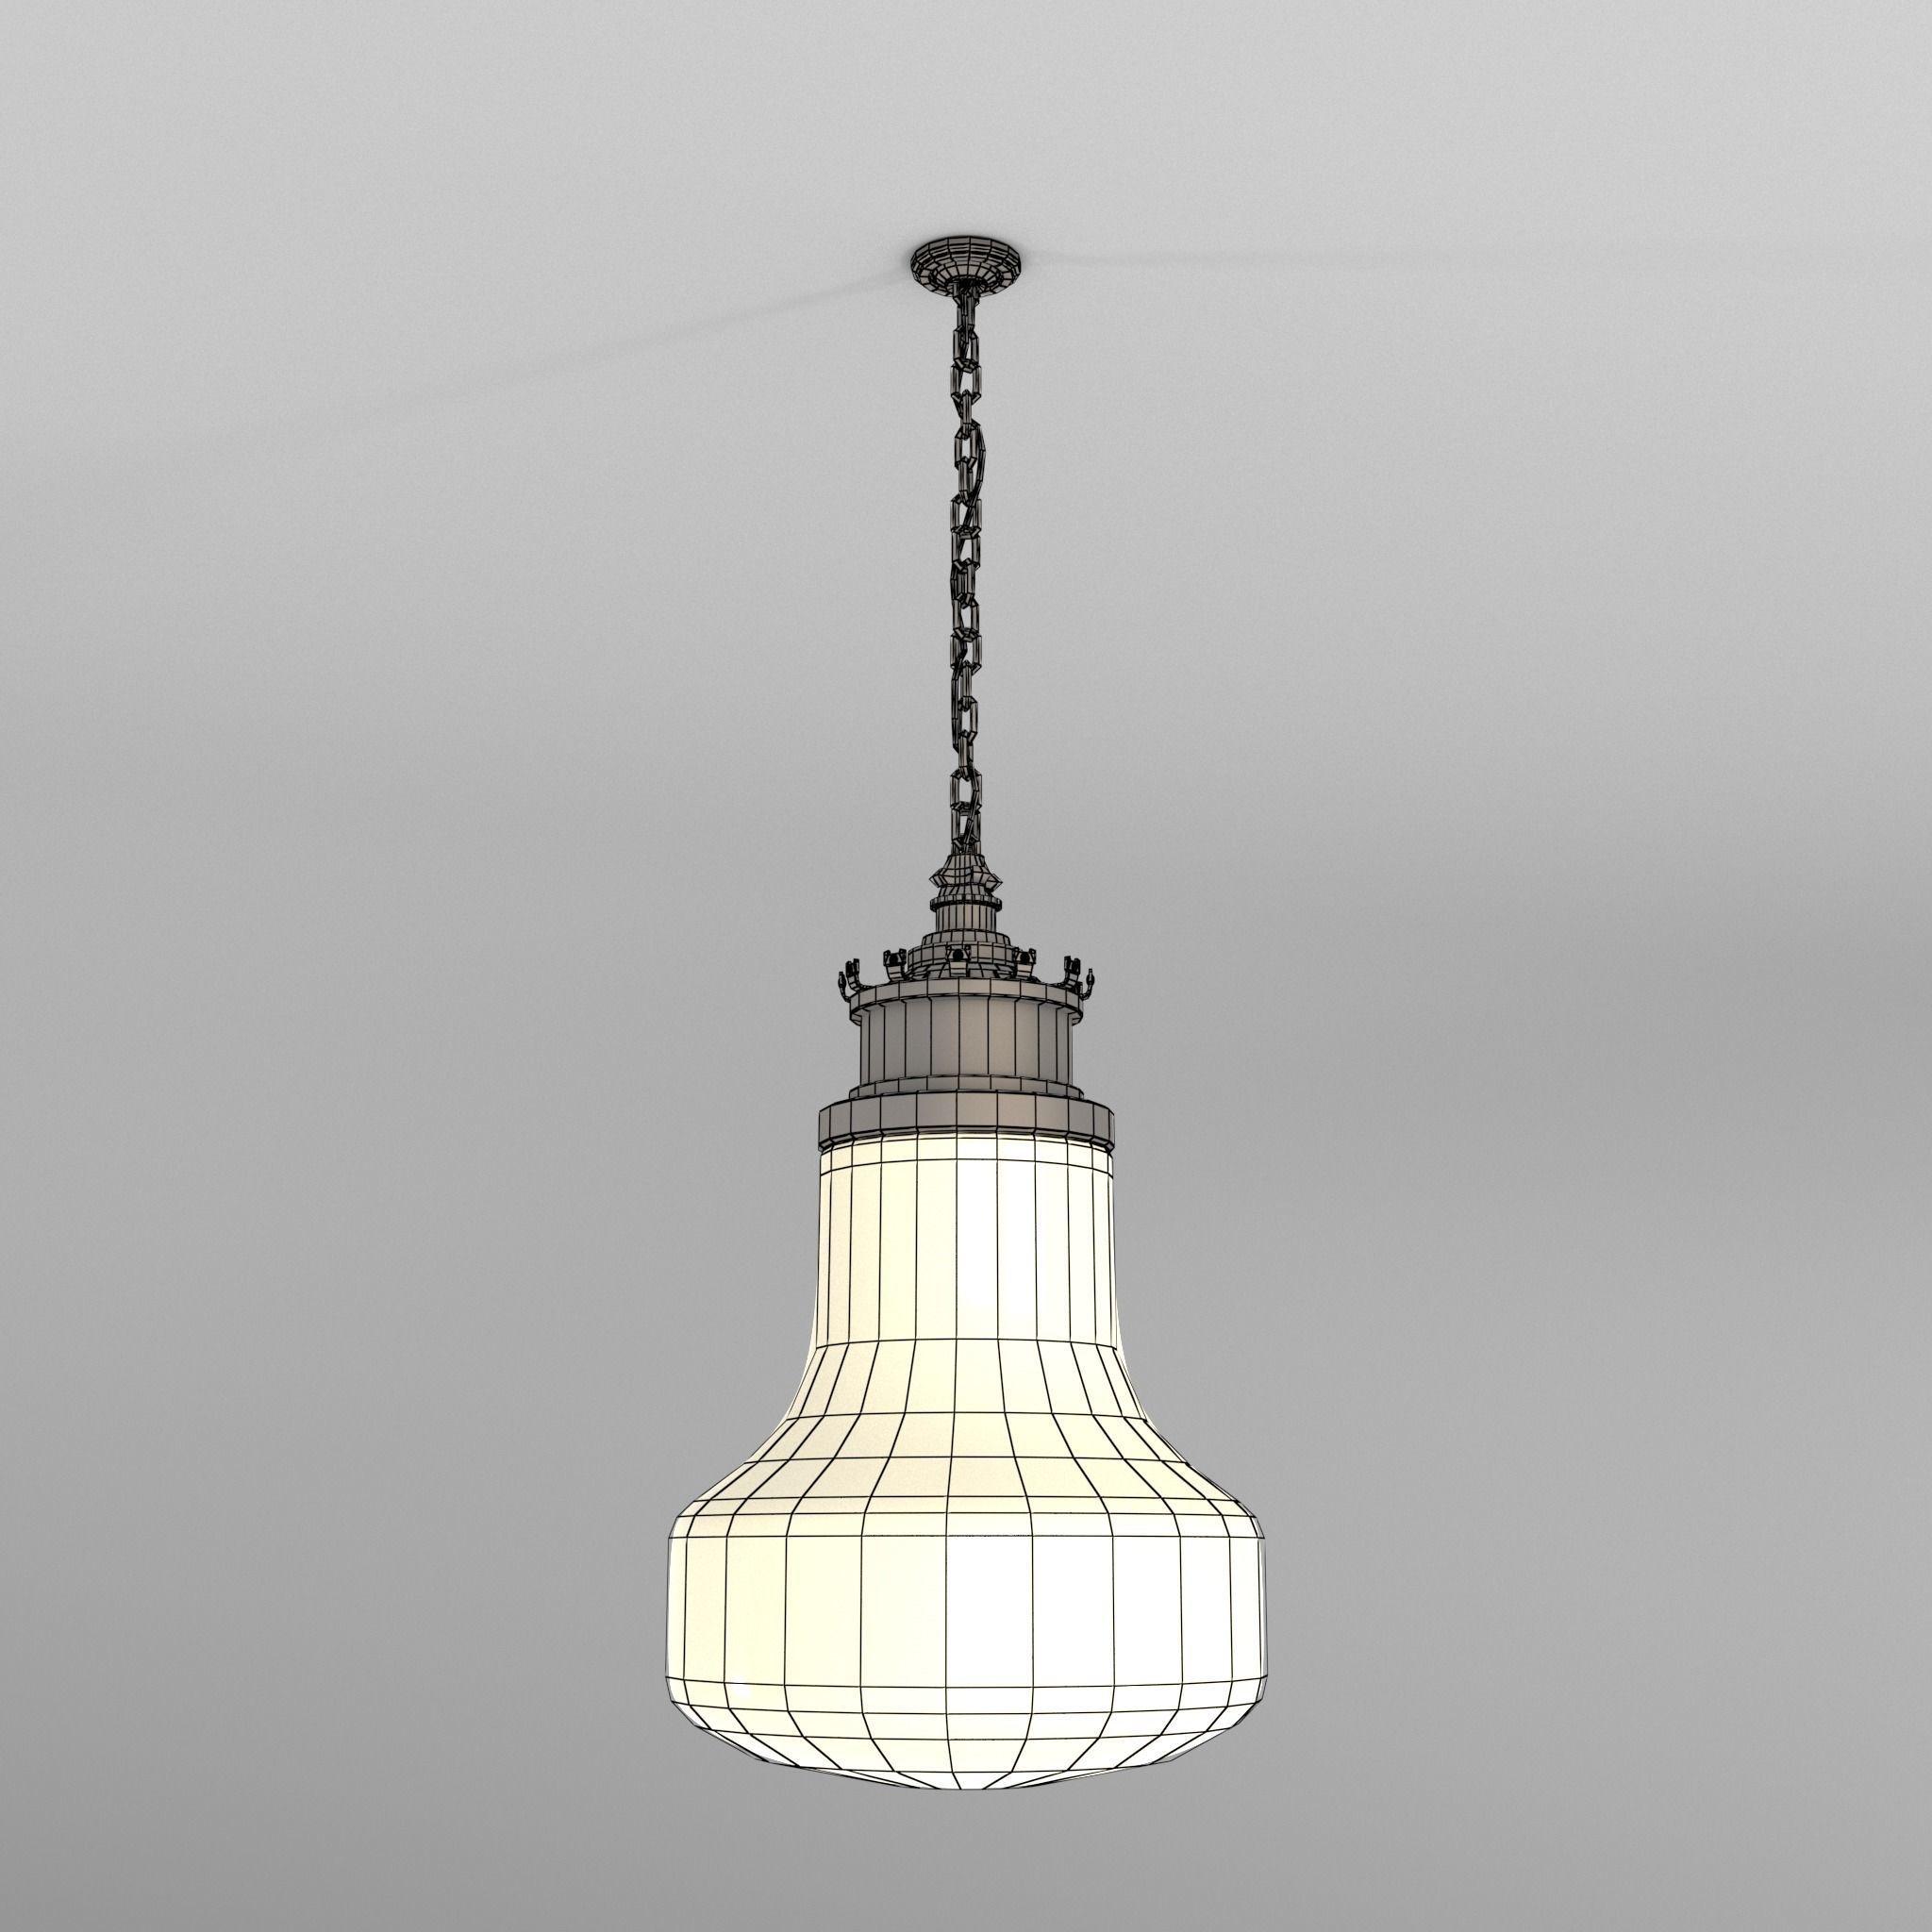 Art Deco Ceiling Light 3d Model Obj Fbx Ma Mb 2